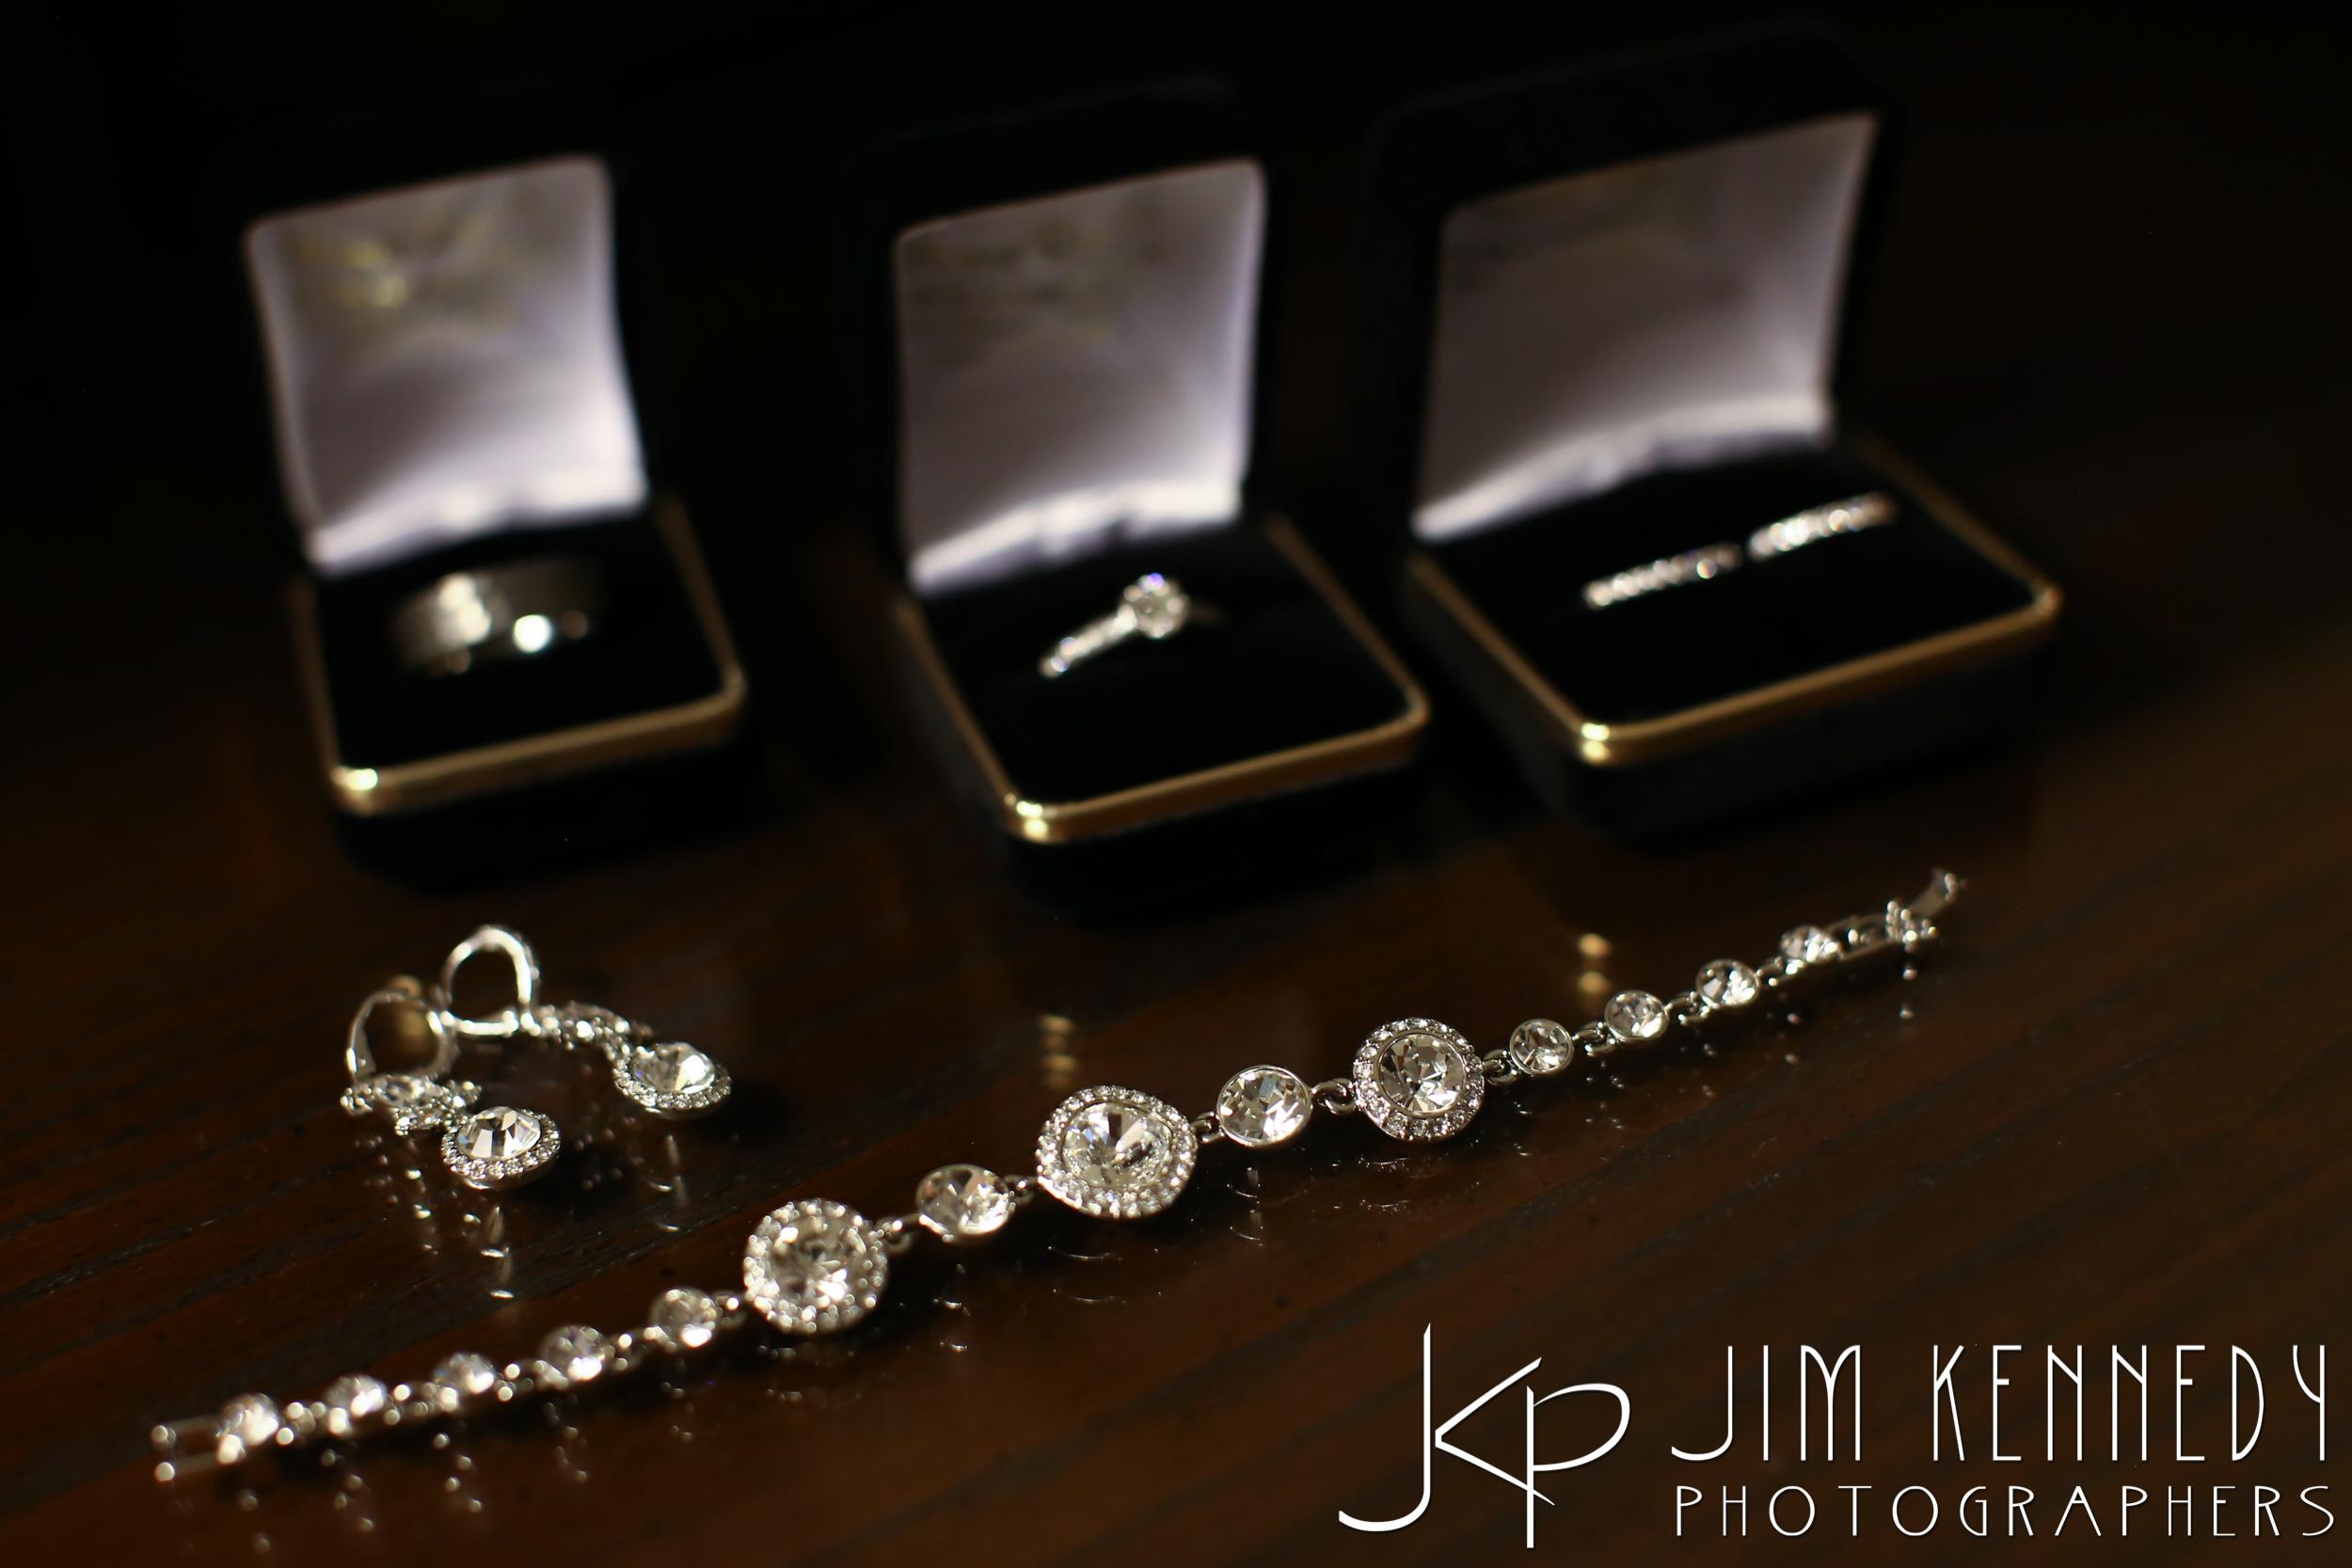 jim_kennedy_photographers_highland_springs_wedding_caitlyn_0007.jpg